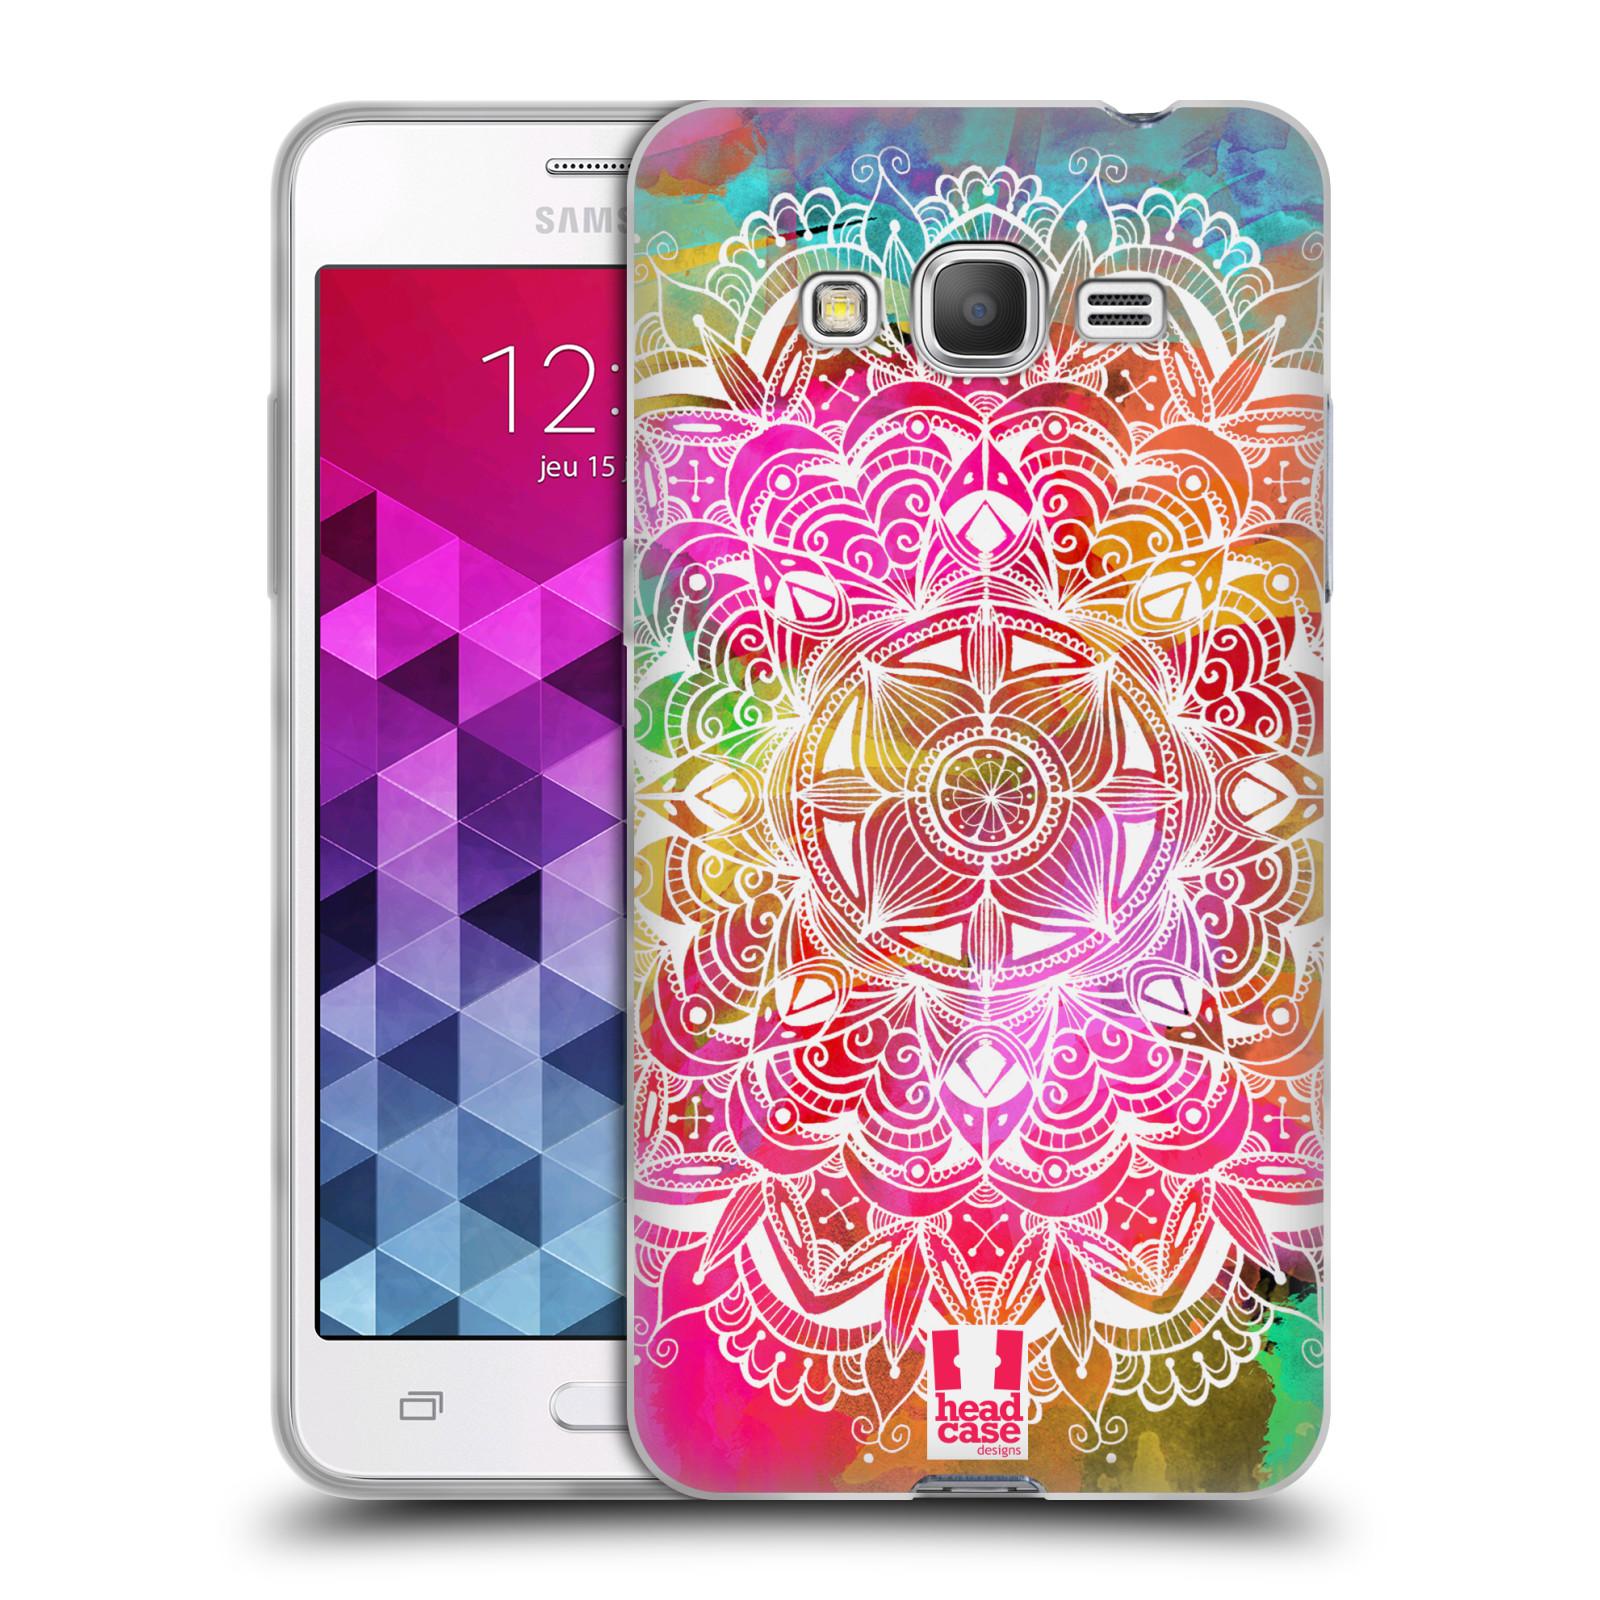 Silikonové pouzdro na mobil Samsung Galaxy Grand Prime HEAD CASE Mandala Doodle Watercolour